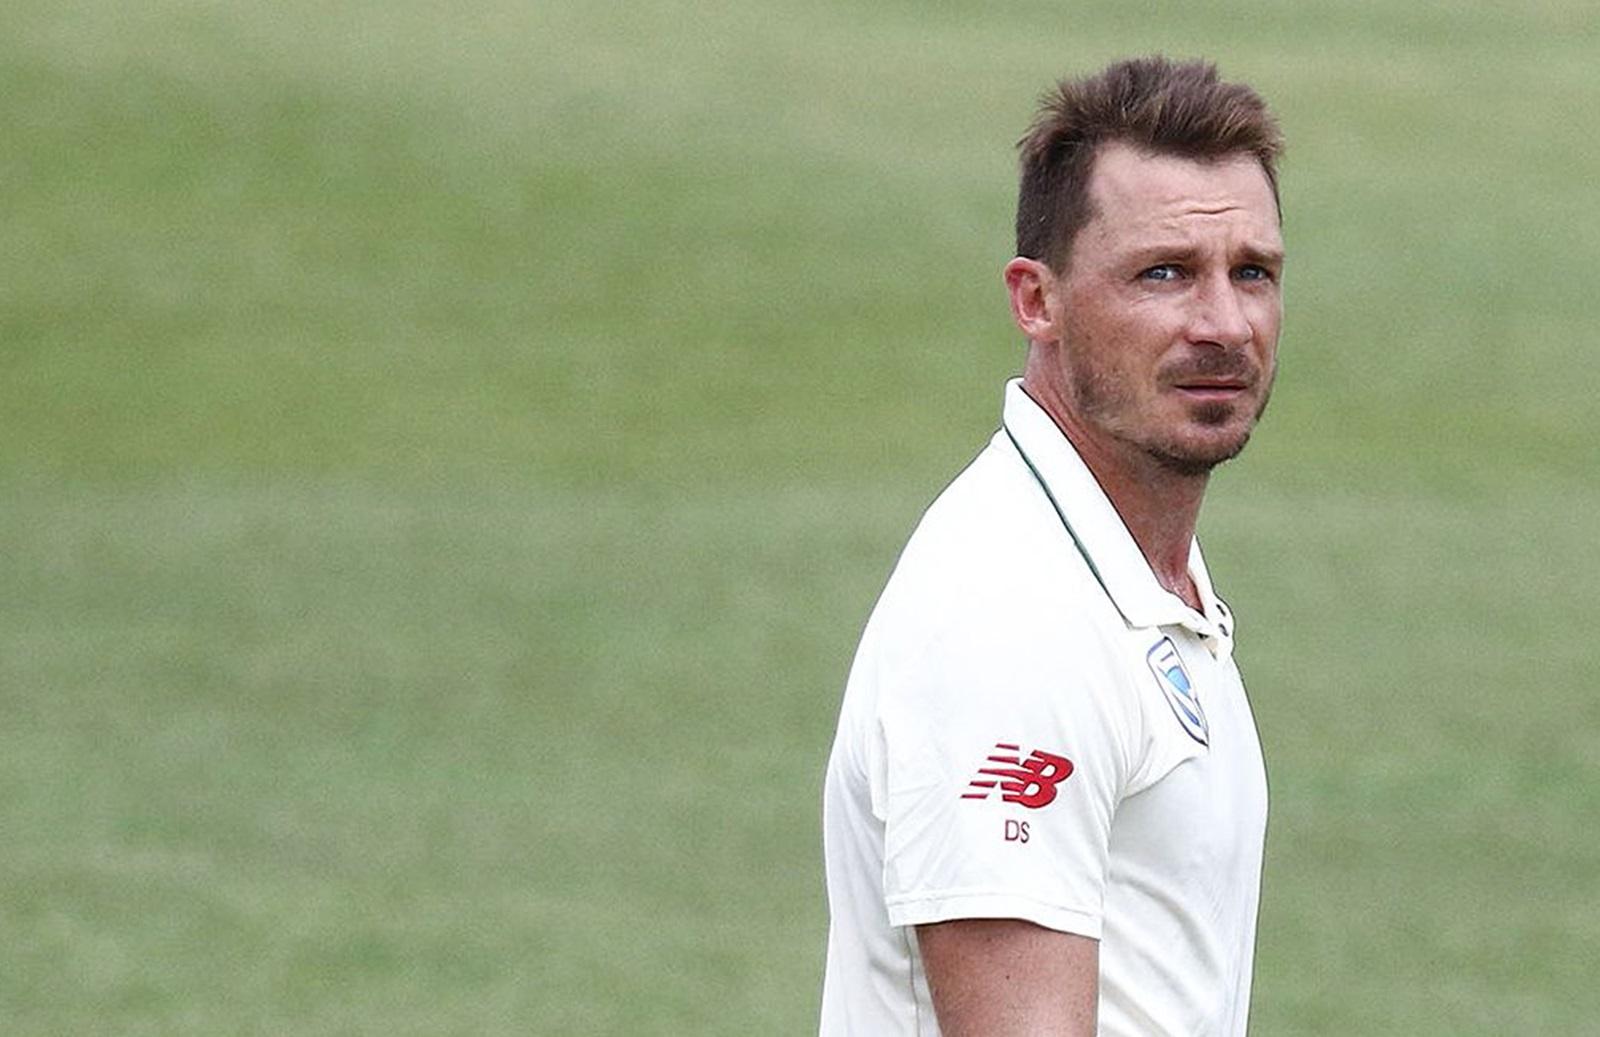 Steyn announces retirement from Test cricket   cricket.com.au